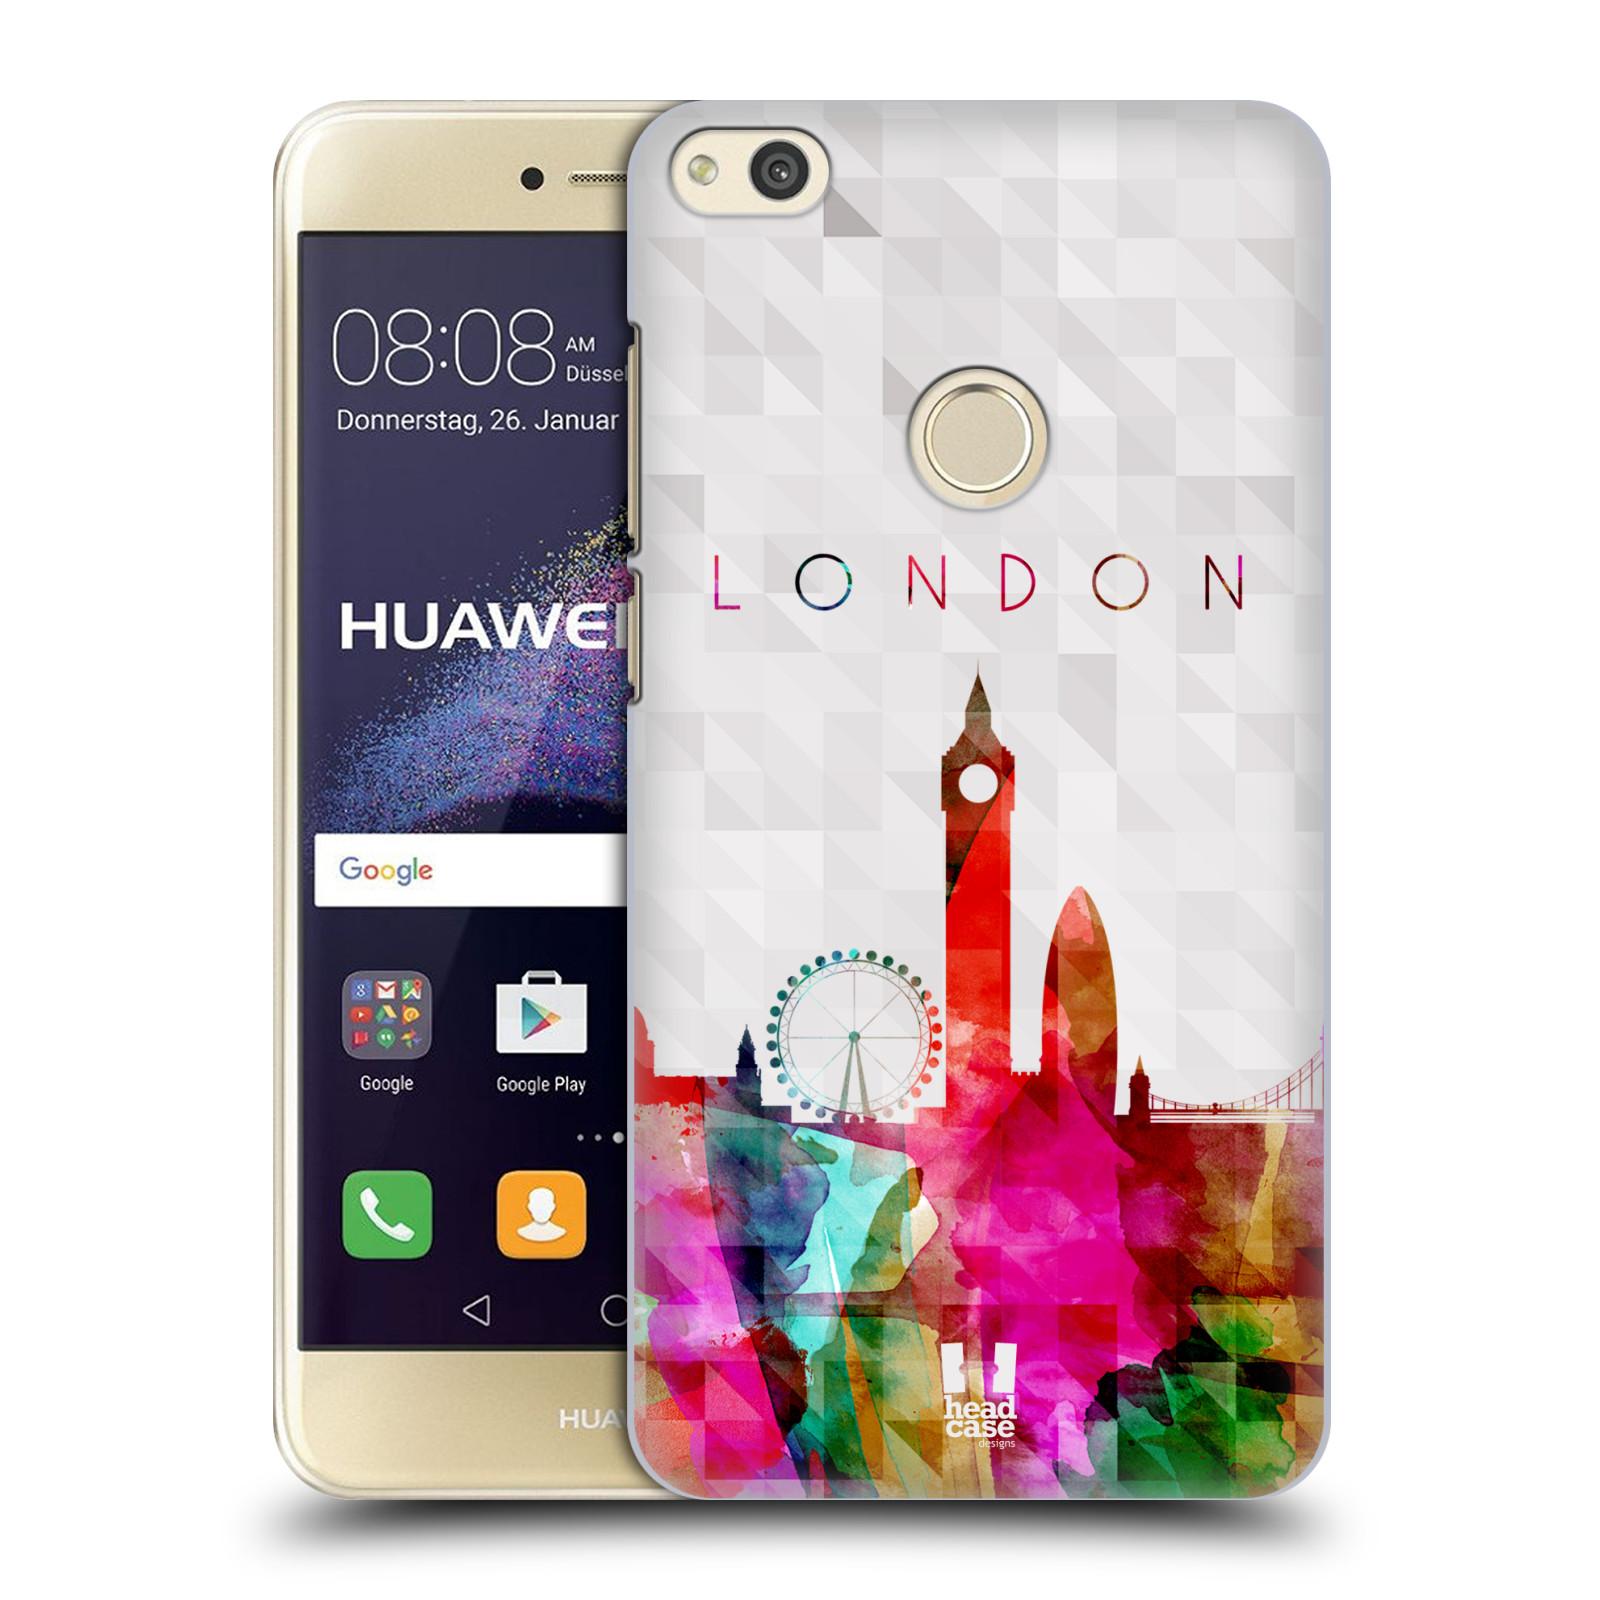 HEAD CASE silikonový obal na mobil Huawei P8 LITE 2017 vzor Vodní barva města silueta LONDÝN BIG BEN ANGLIE